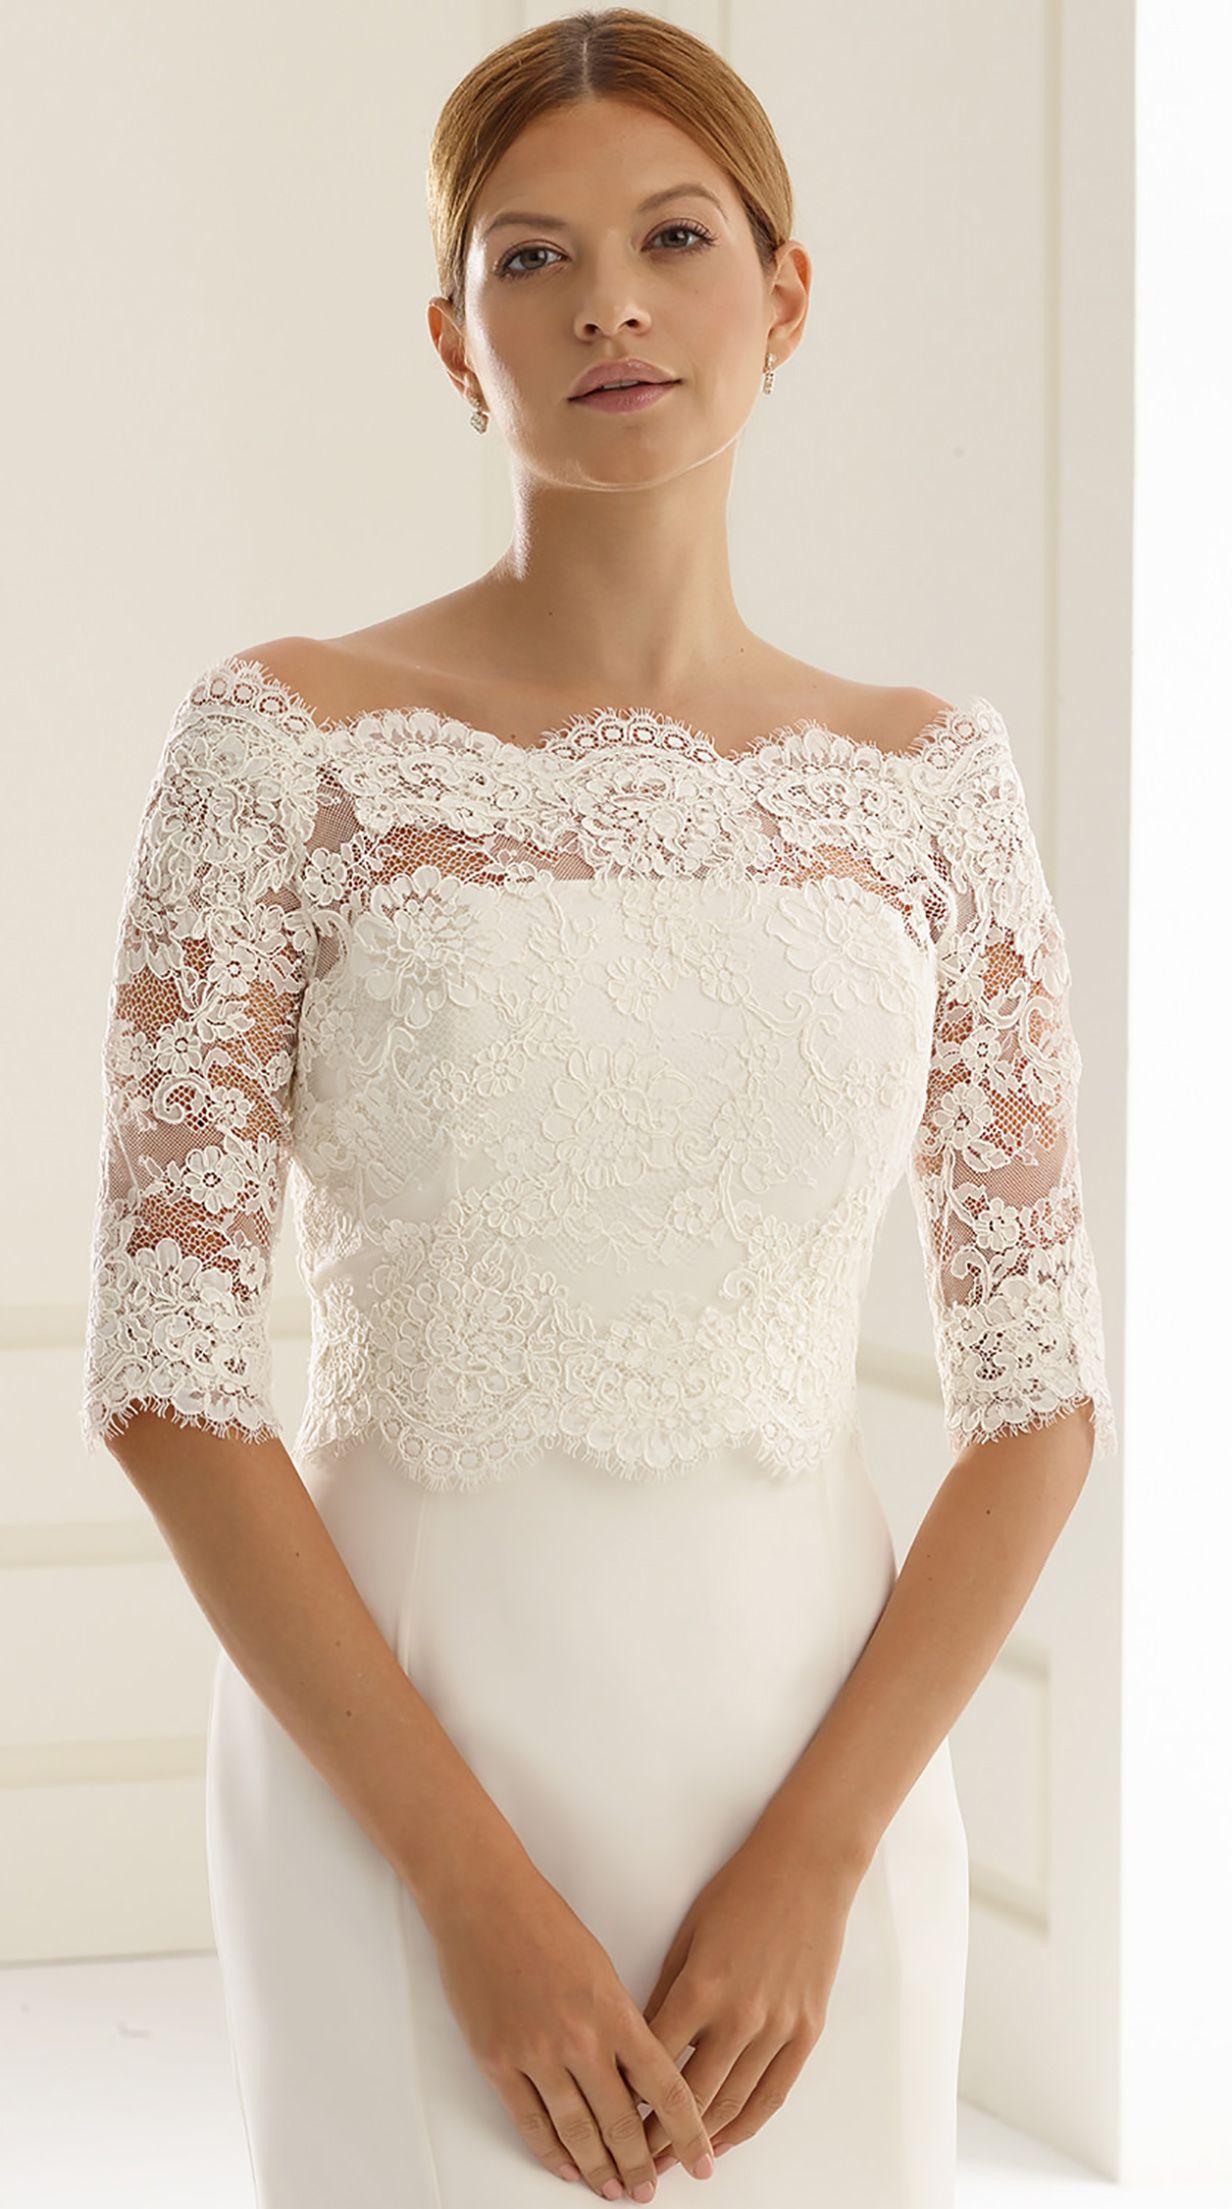 96def96ad7 Stunning bolero E237 from Bianco Evento #biancoevento #bolero #weddingdress  #weddingideas #bridetobe